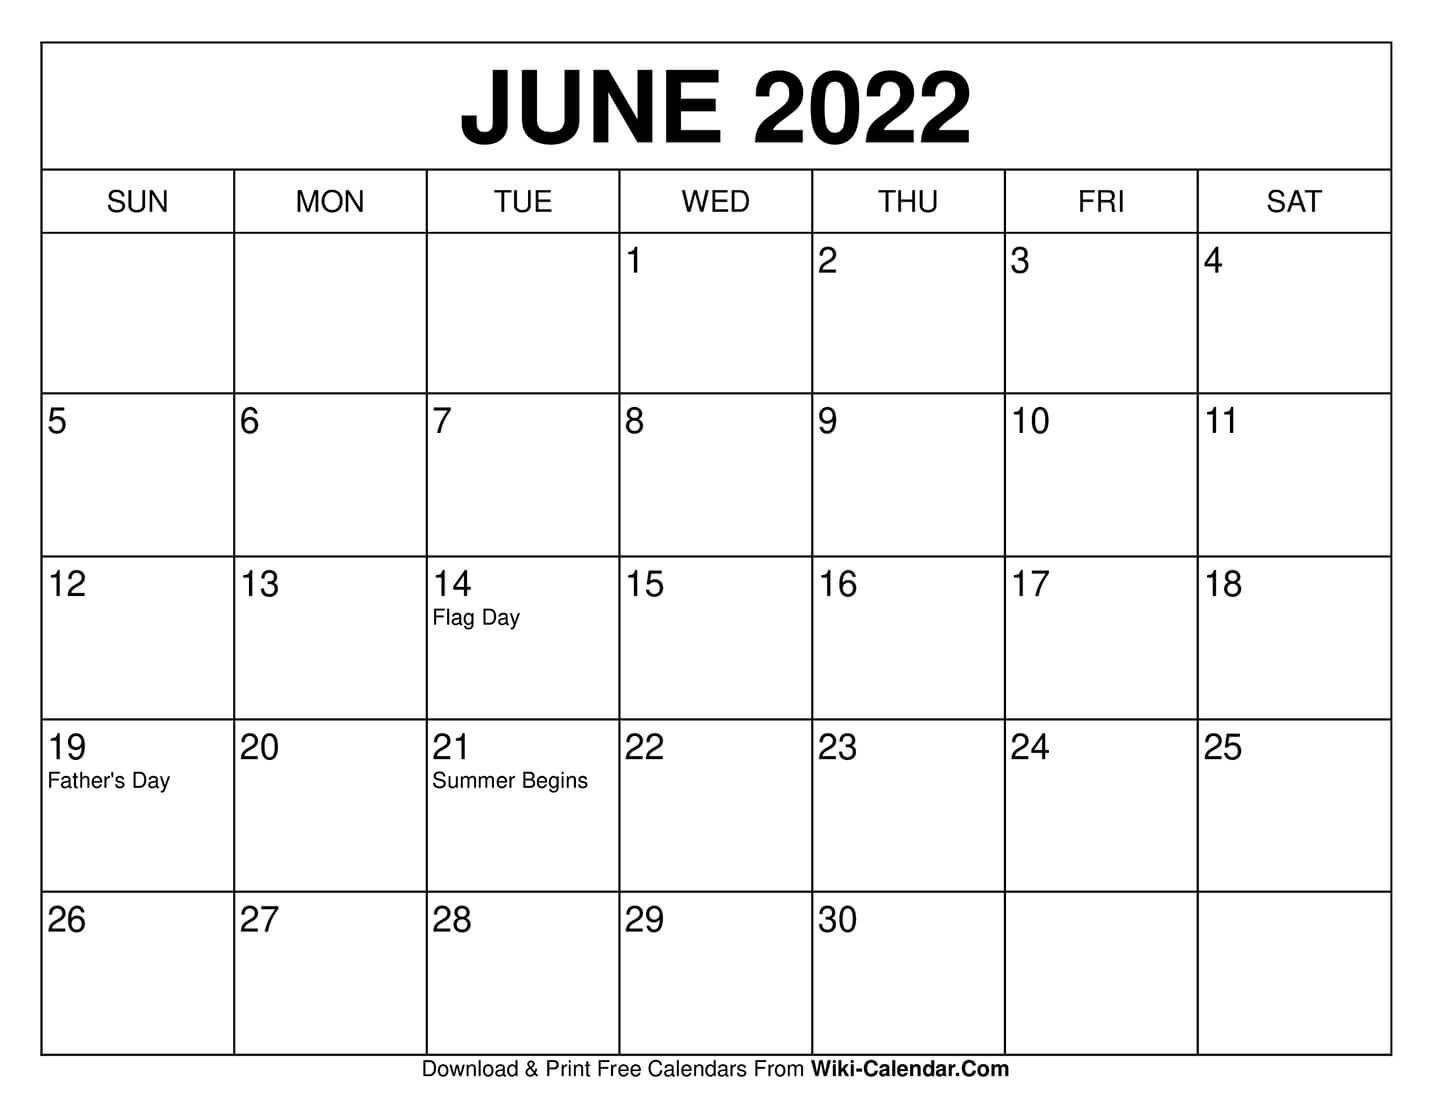 Blank Calendar 2022 June.June 2022 Calendar Calendar Printables Free Calendars To Print Print Calendar